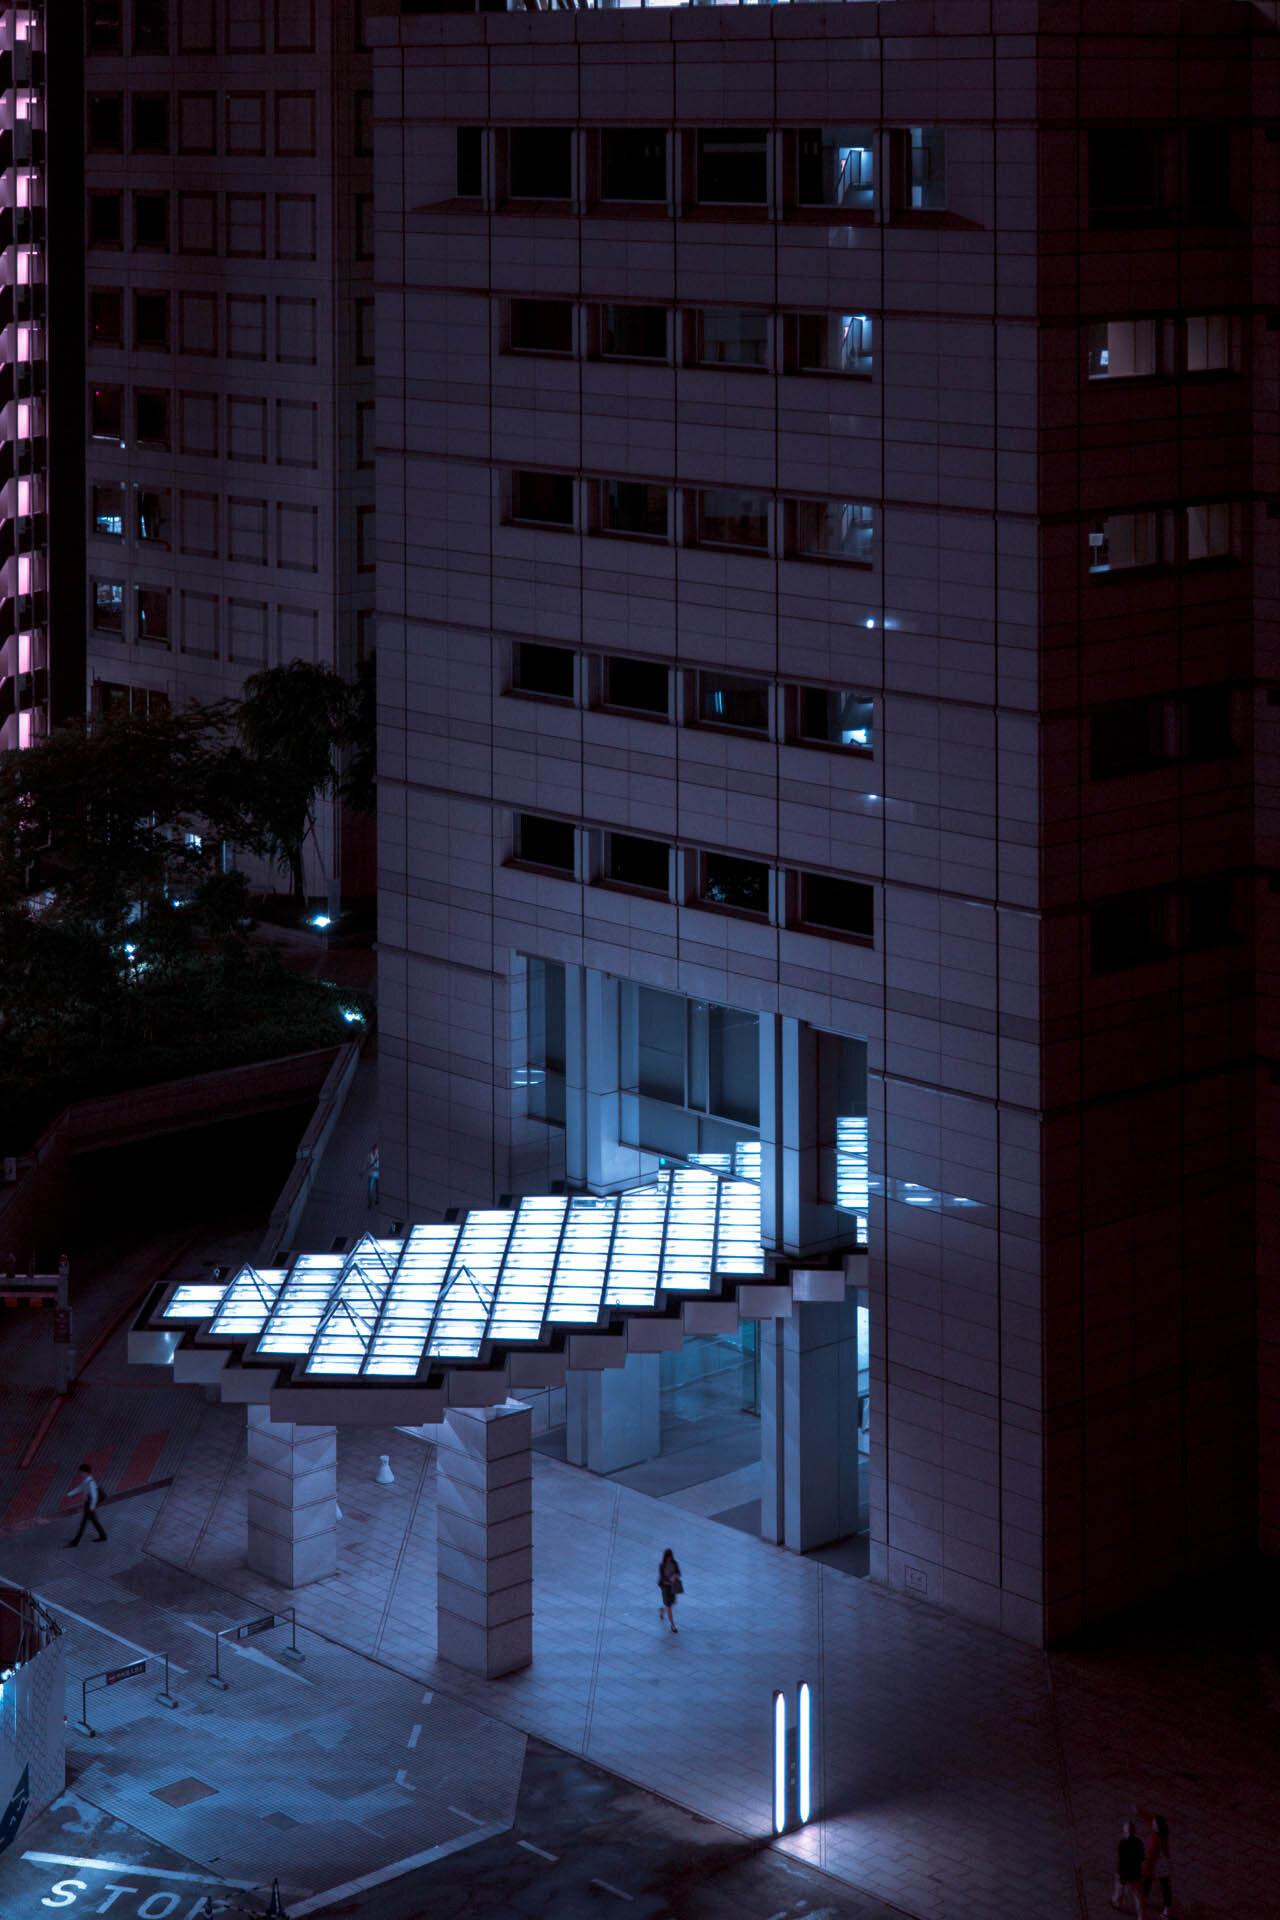 silent-city-5.jpg